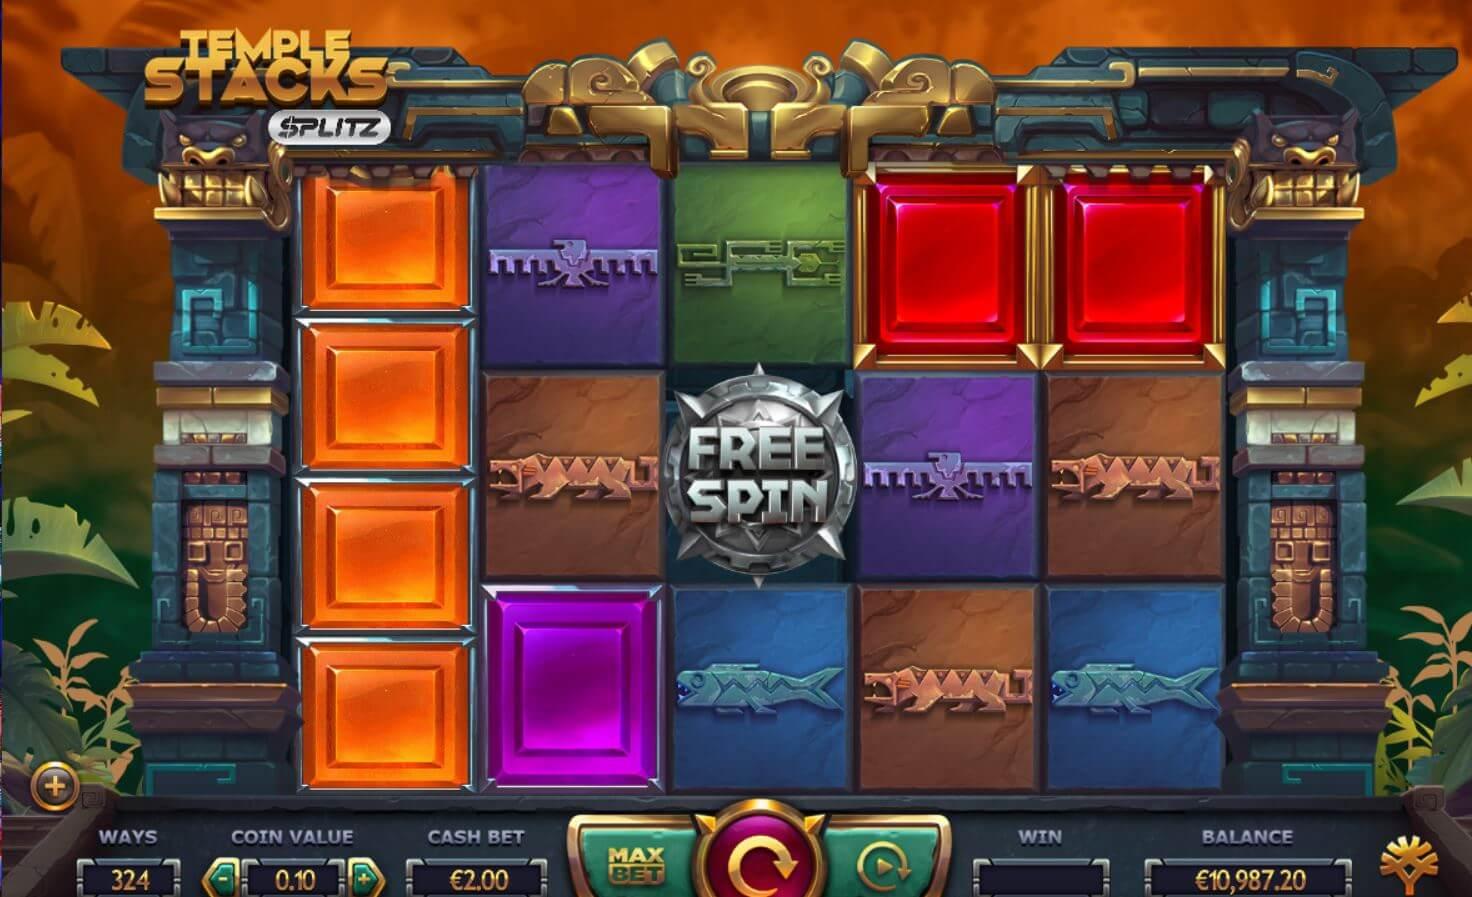 Temple Stacks Splitz Slot Gameplay